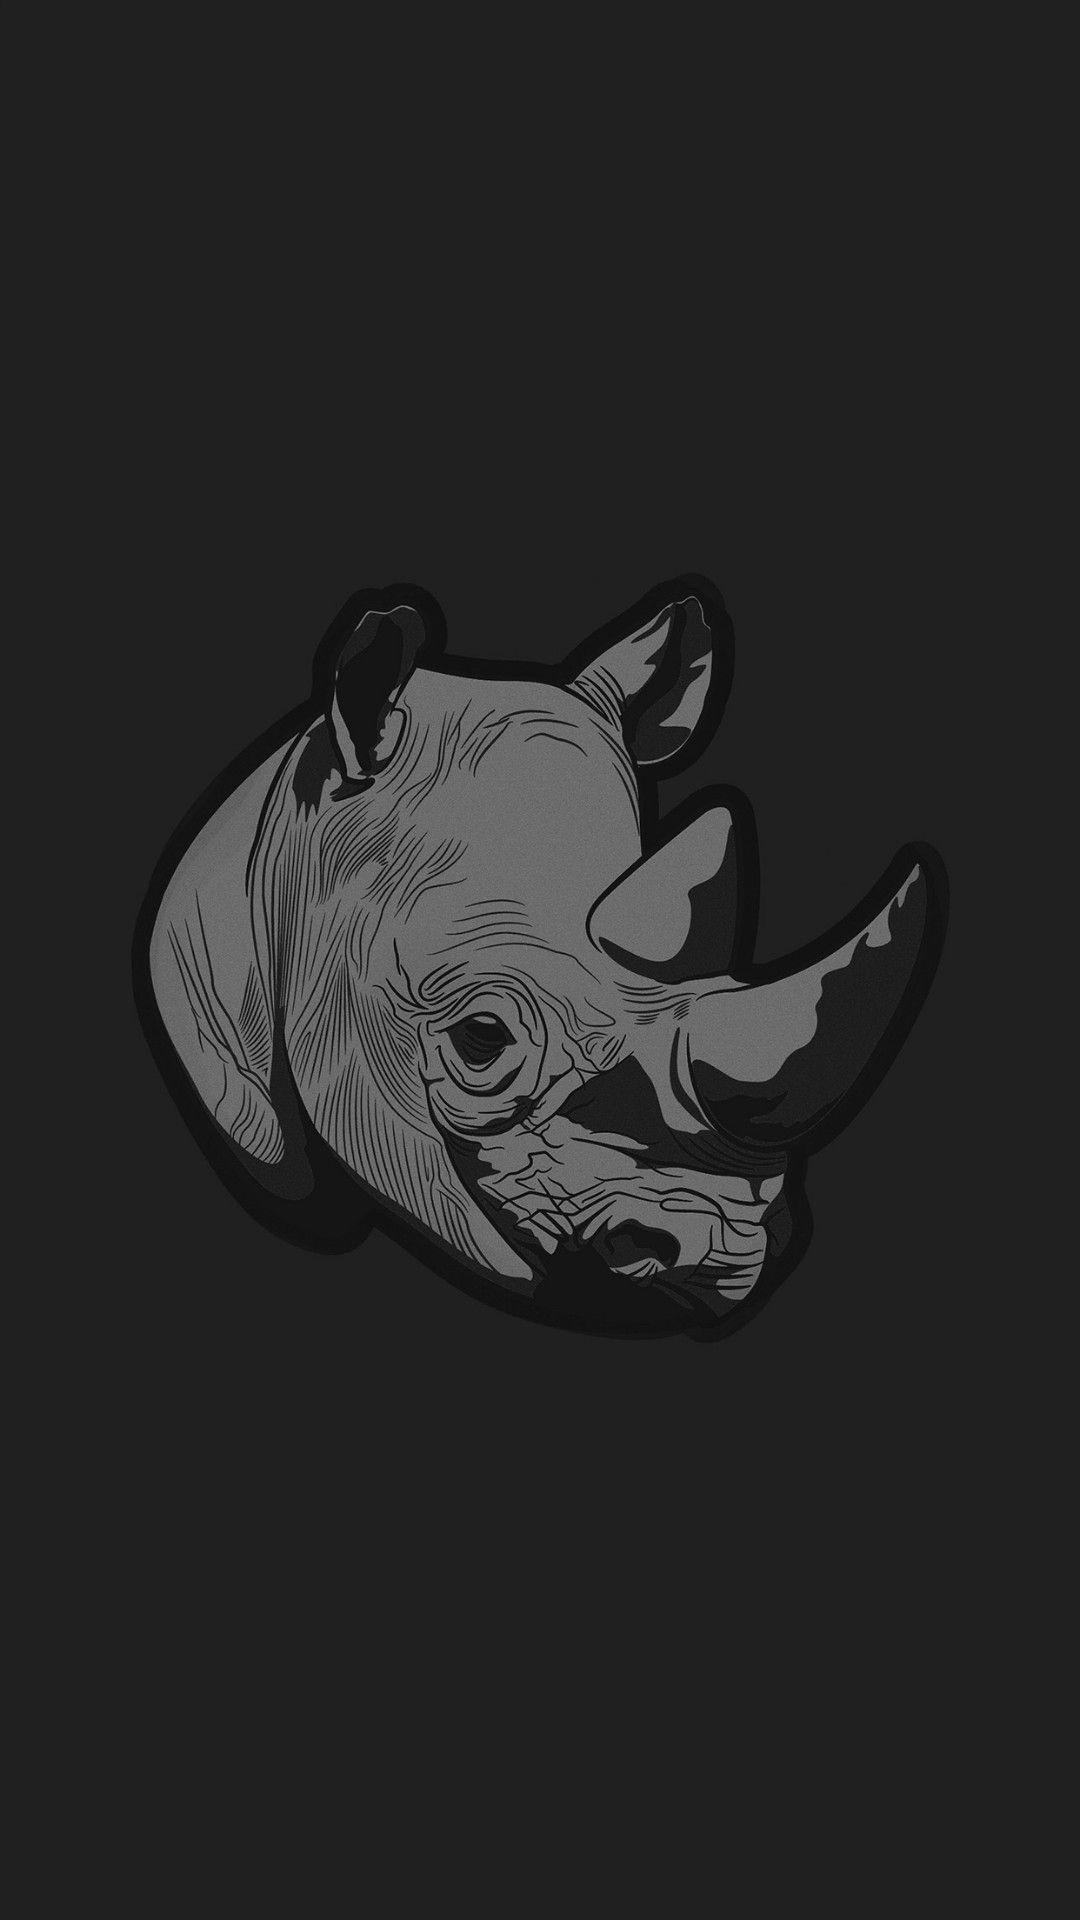 Thoughtful Rhino Dark Minimal Illust Art Iphone 7 Wallpaper Minimalist Animal Ipad Wallpaper Iphone 6 Wallpaper